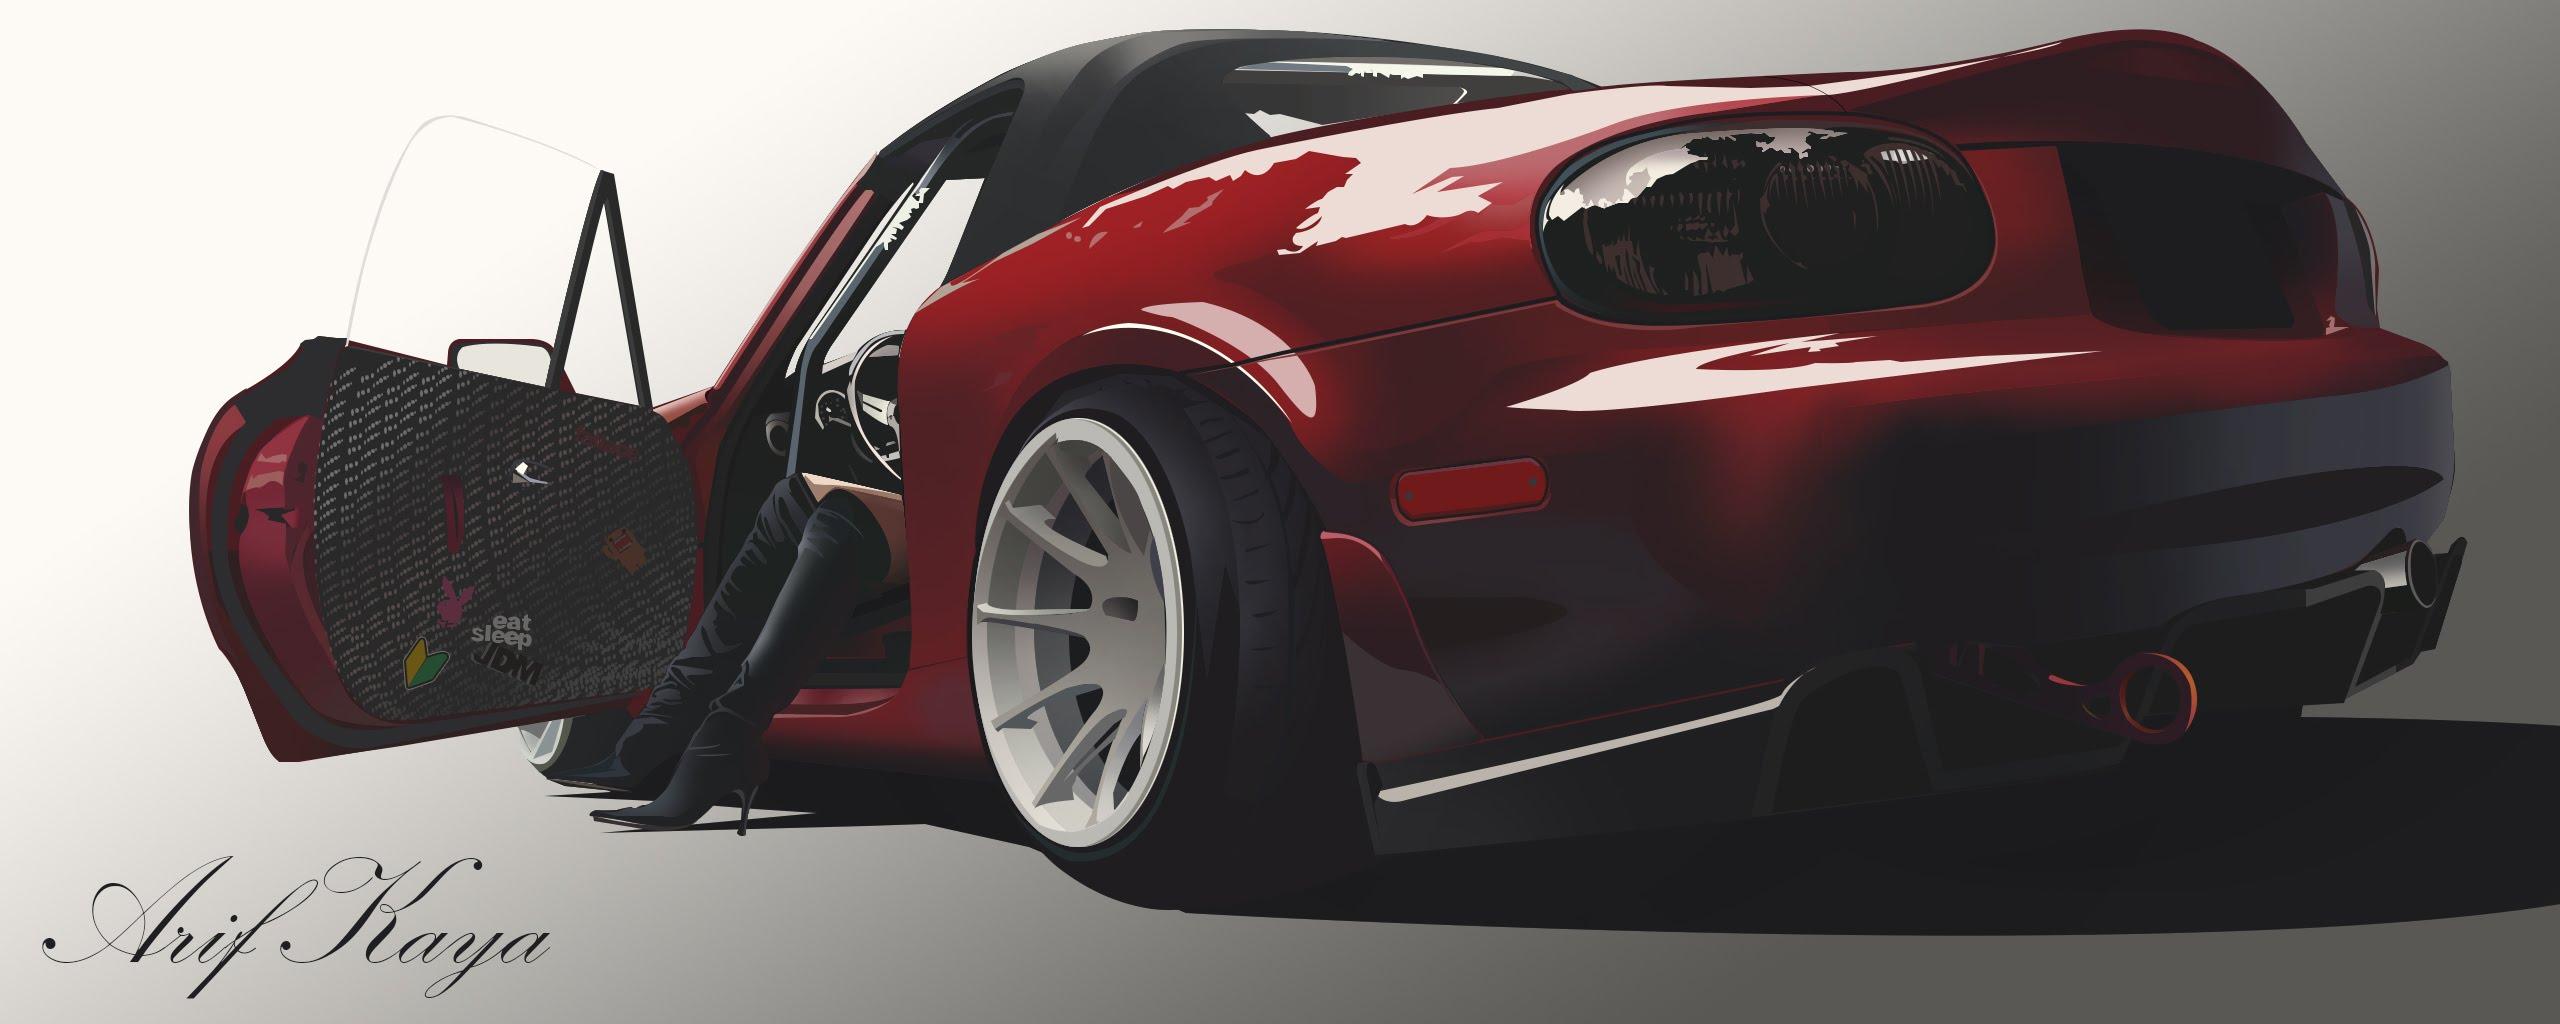 Miata Drawing At Free For Personal Use 2oo1 Mx 5 Mazda Fuse Box 2560x1024 Photoshop Mx5